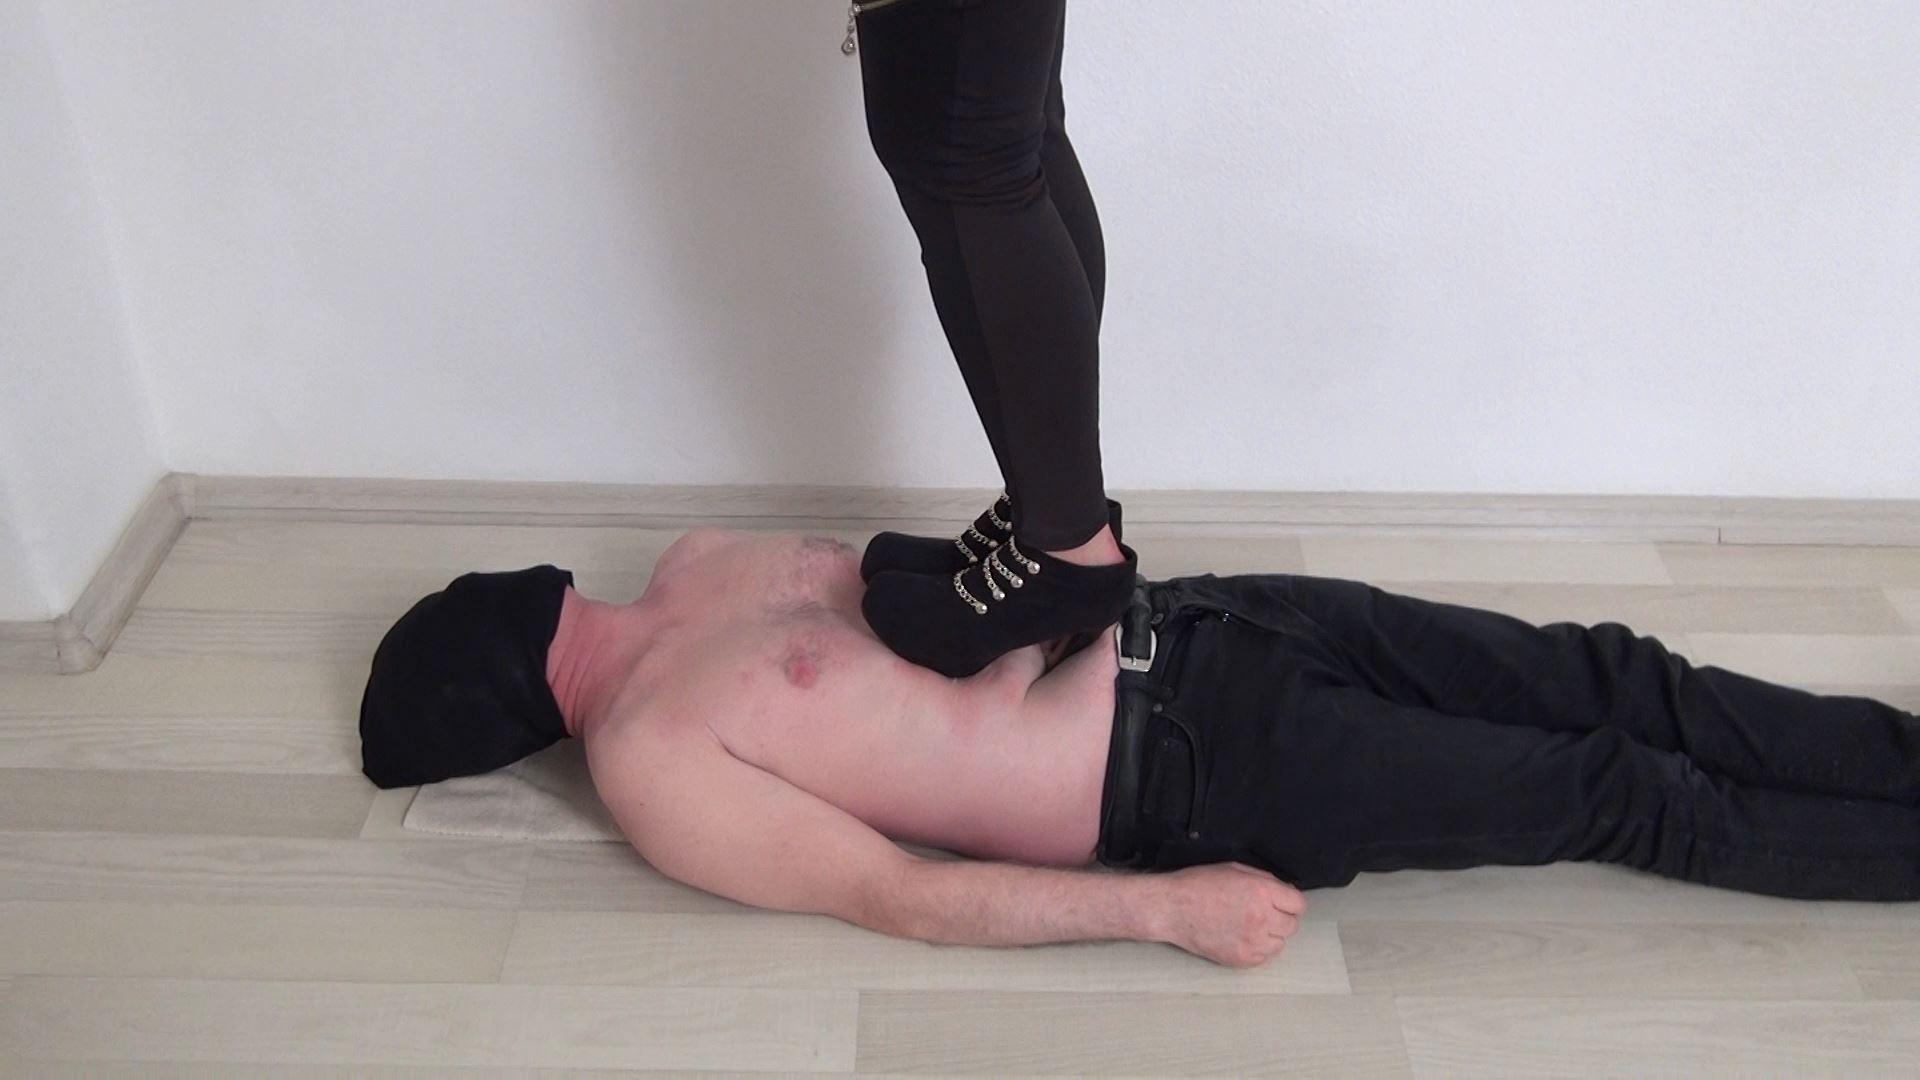 Mistress Maya In Scene: HARD Trampling in Extreme High Heels - ABBIECATFETISH - FULL HD/1080p/MP4